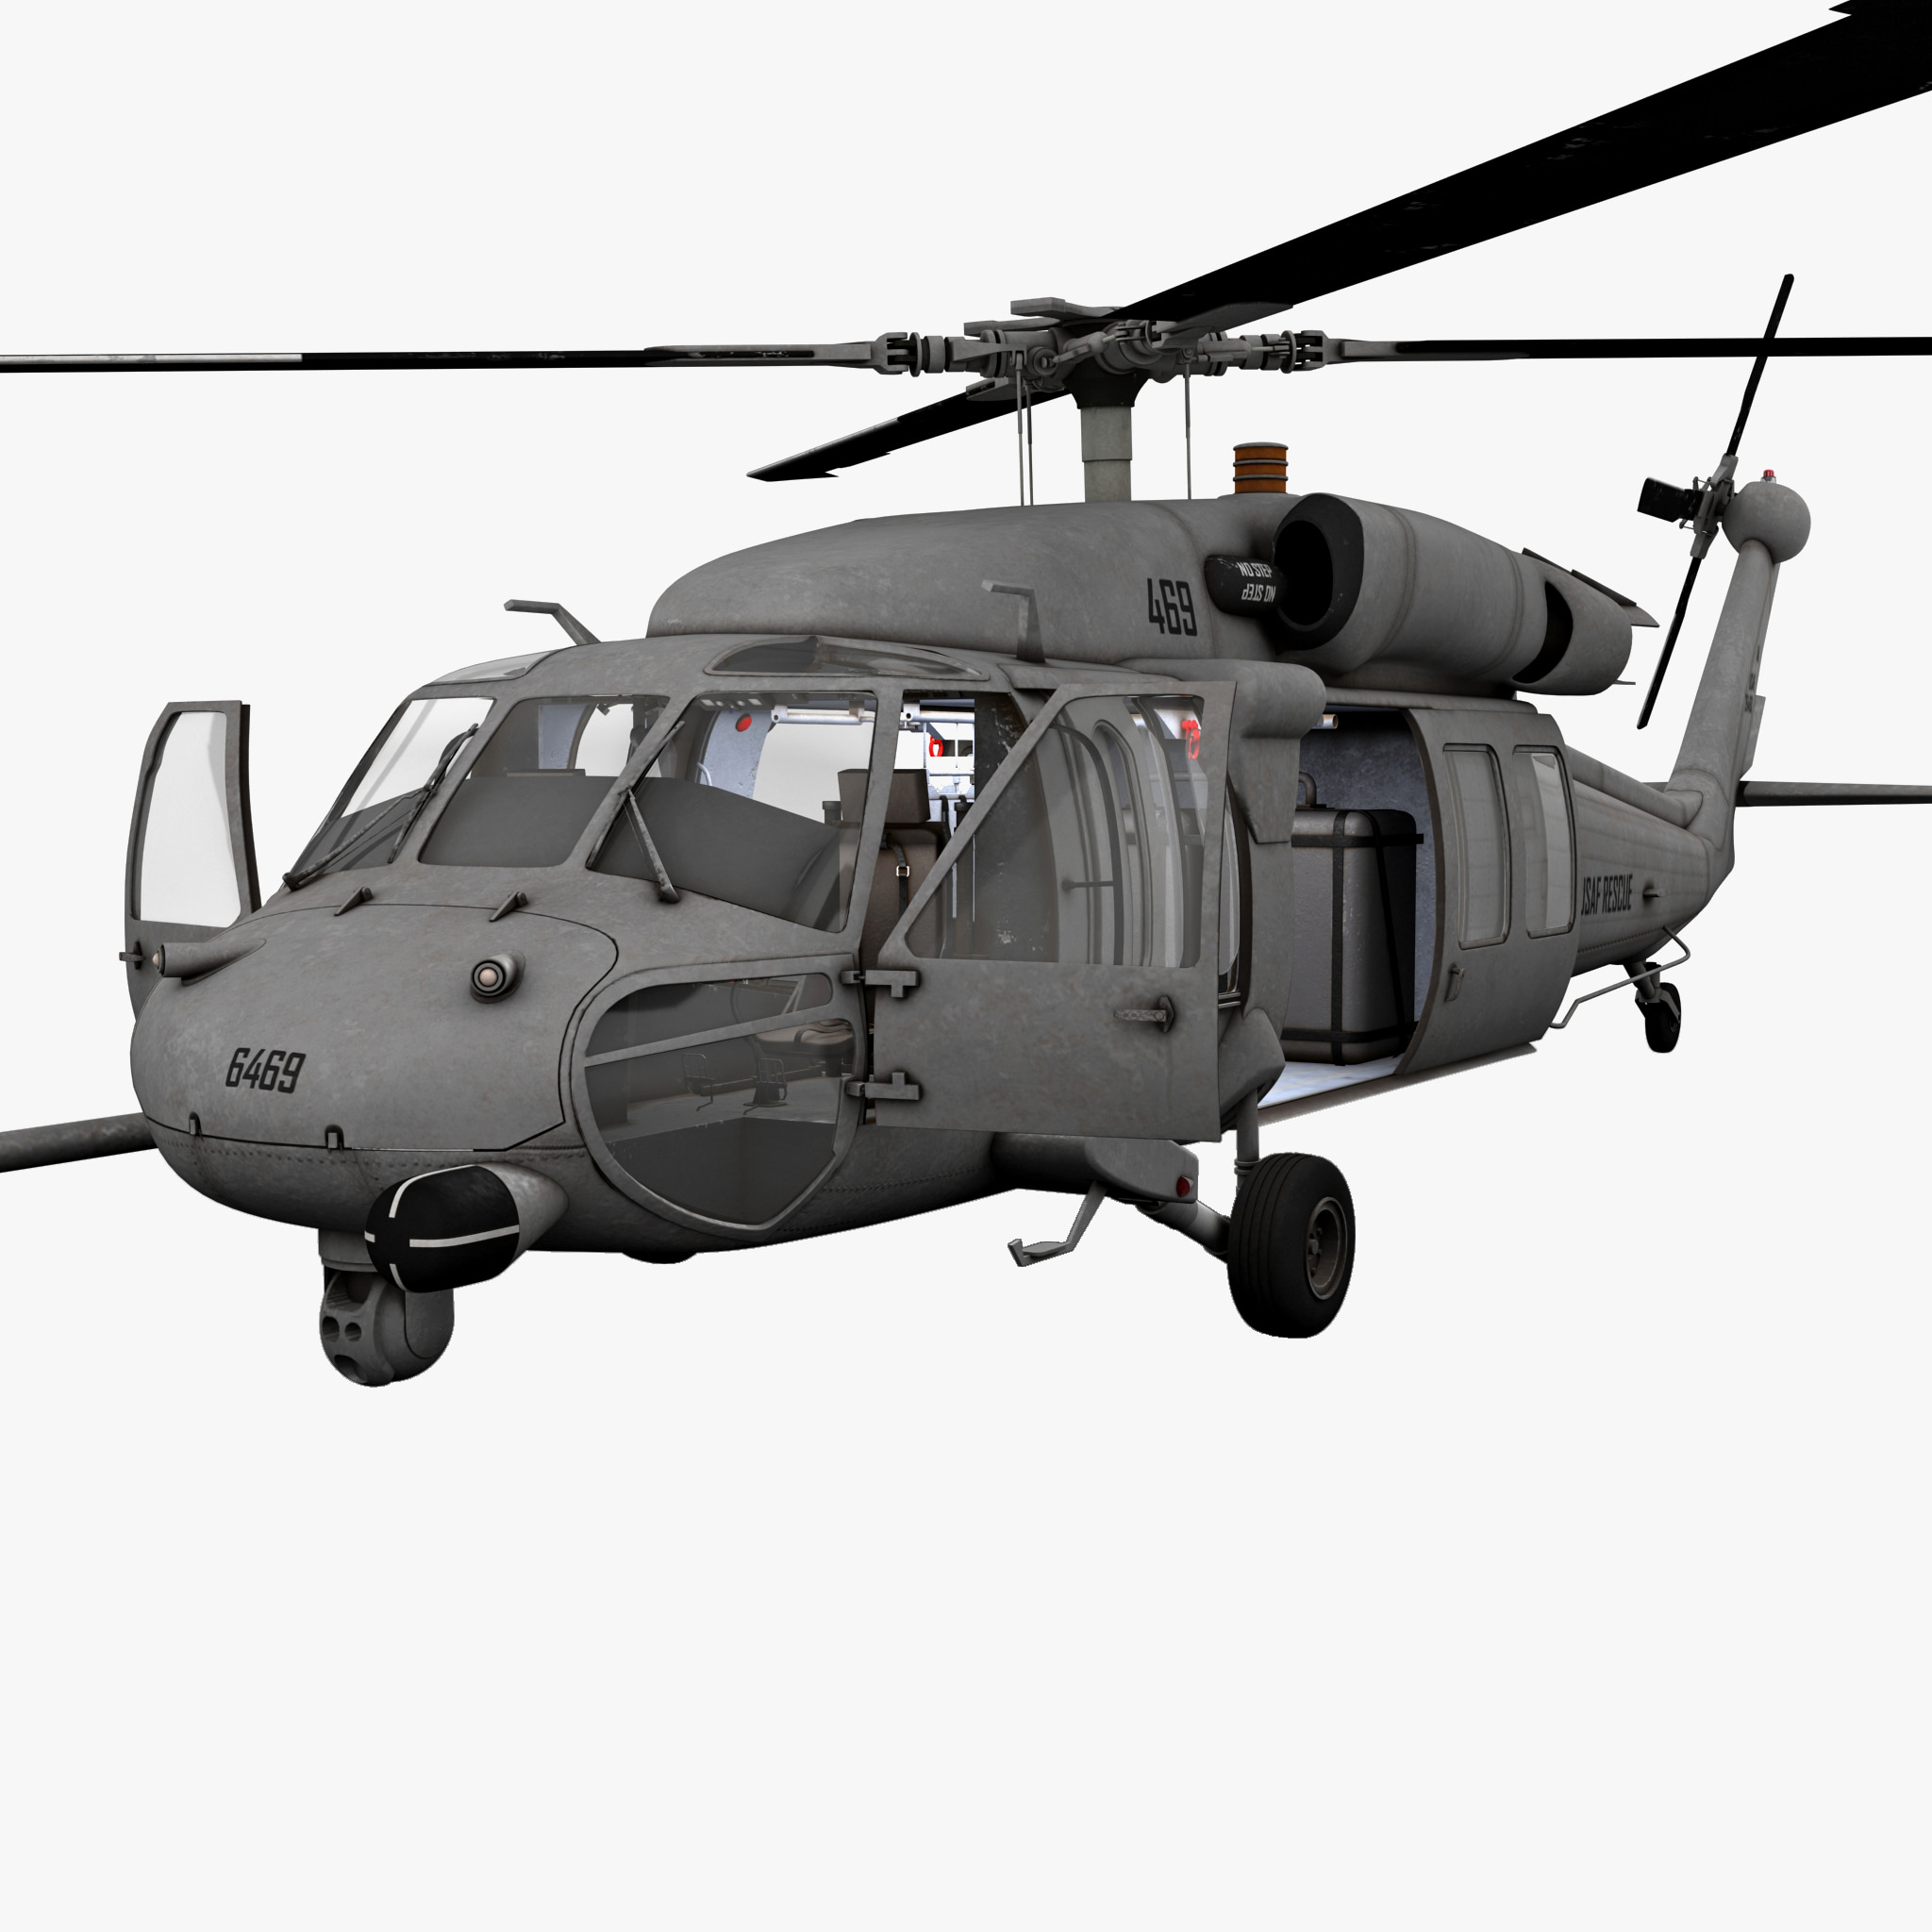 HH-60 Pave Hawk_1.jpg